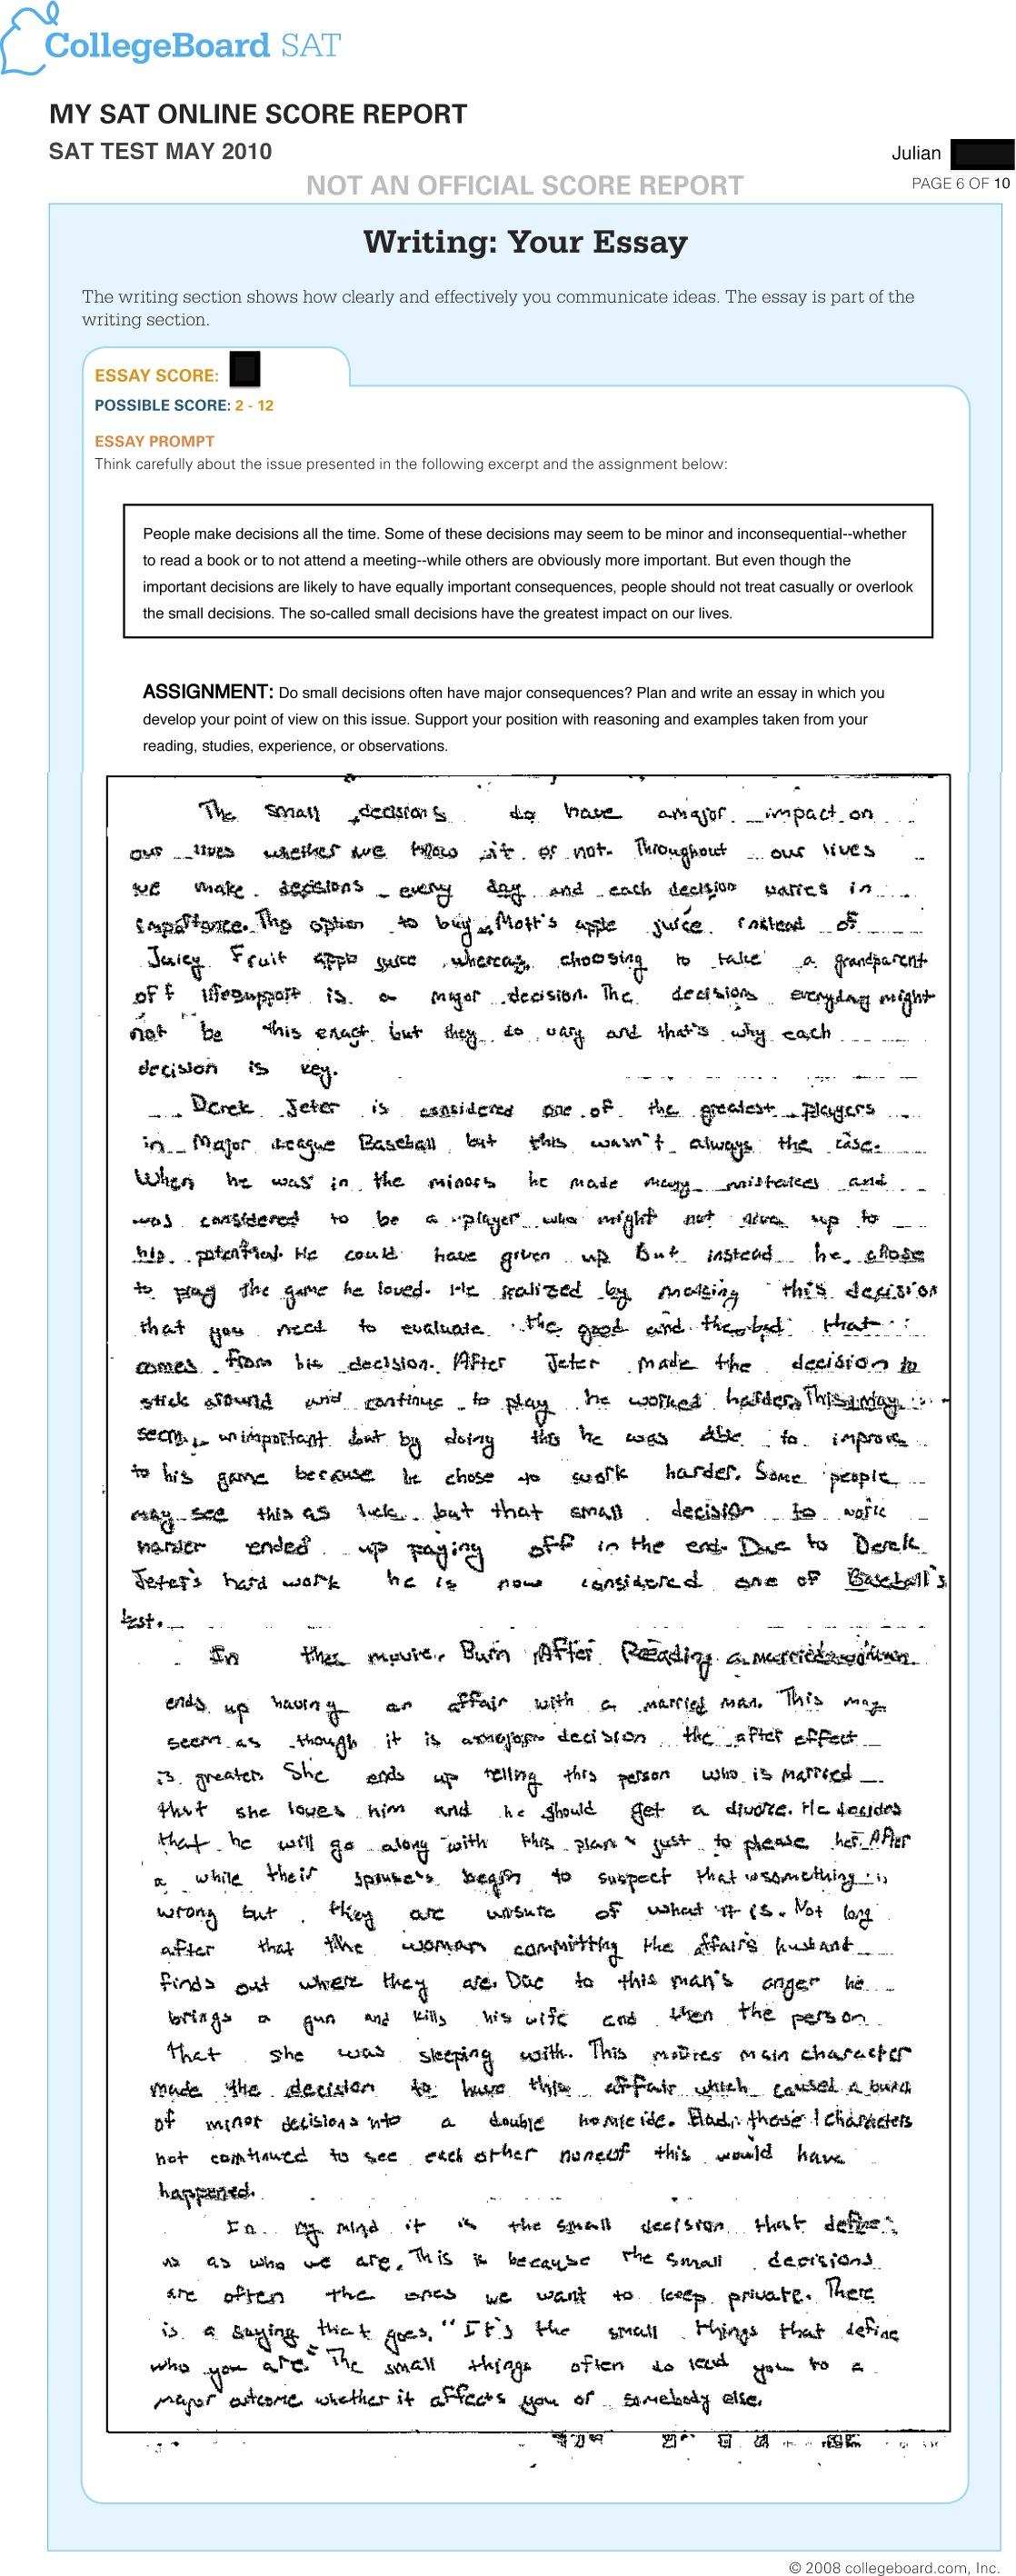 003 Essay Example Jr May Sat Amazing Scoring Score Percentiles 2017 Examples 6 2018 Full